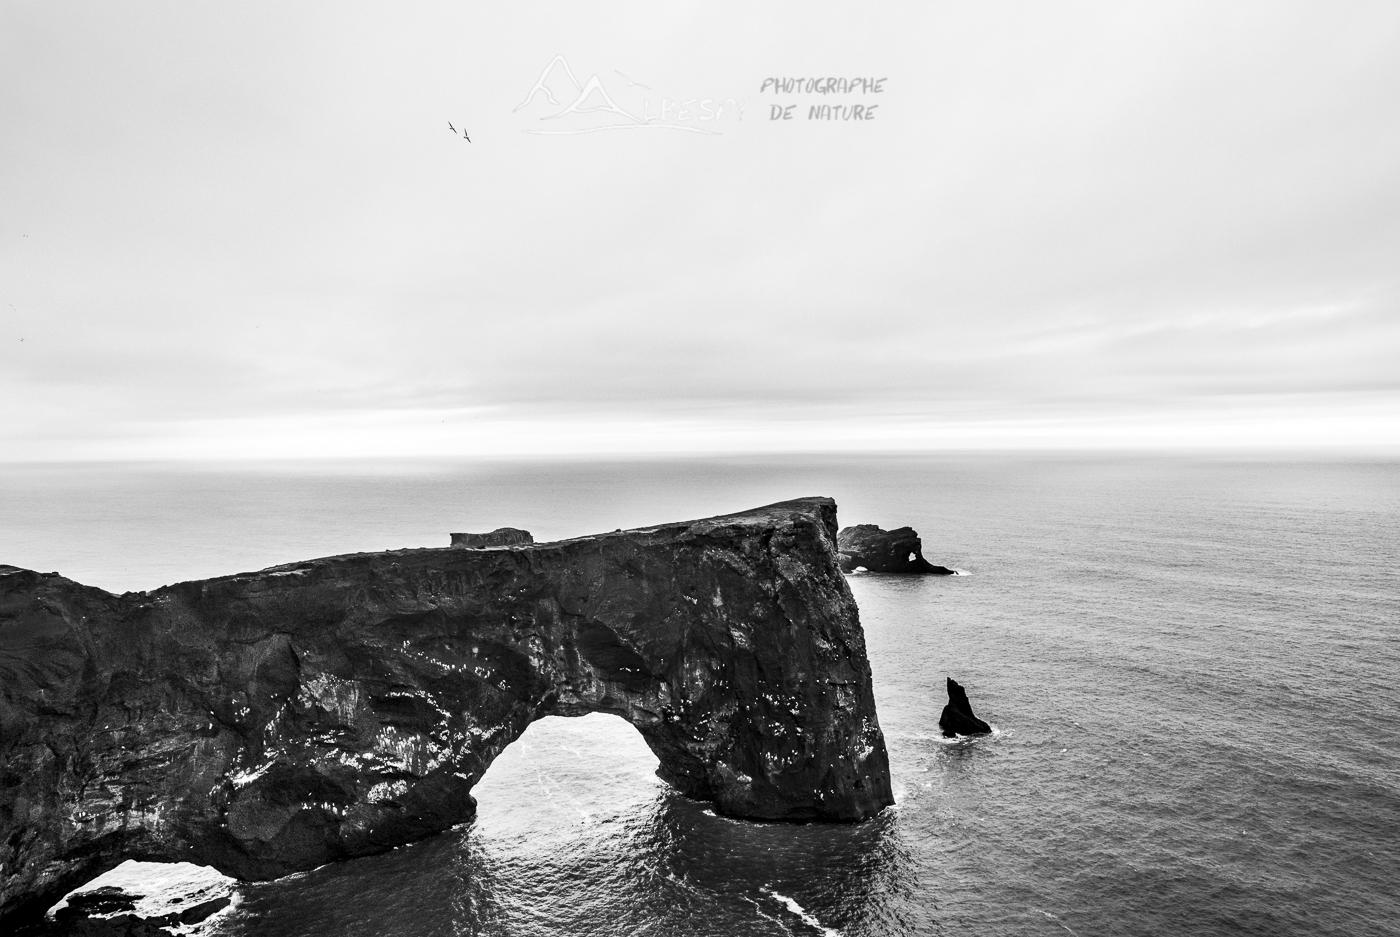 Arche de Dyrholaey n°0801